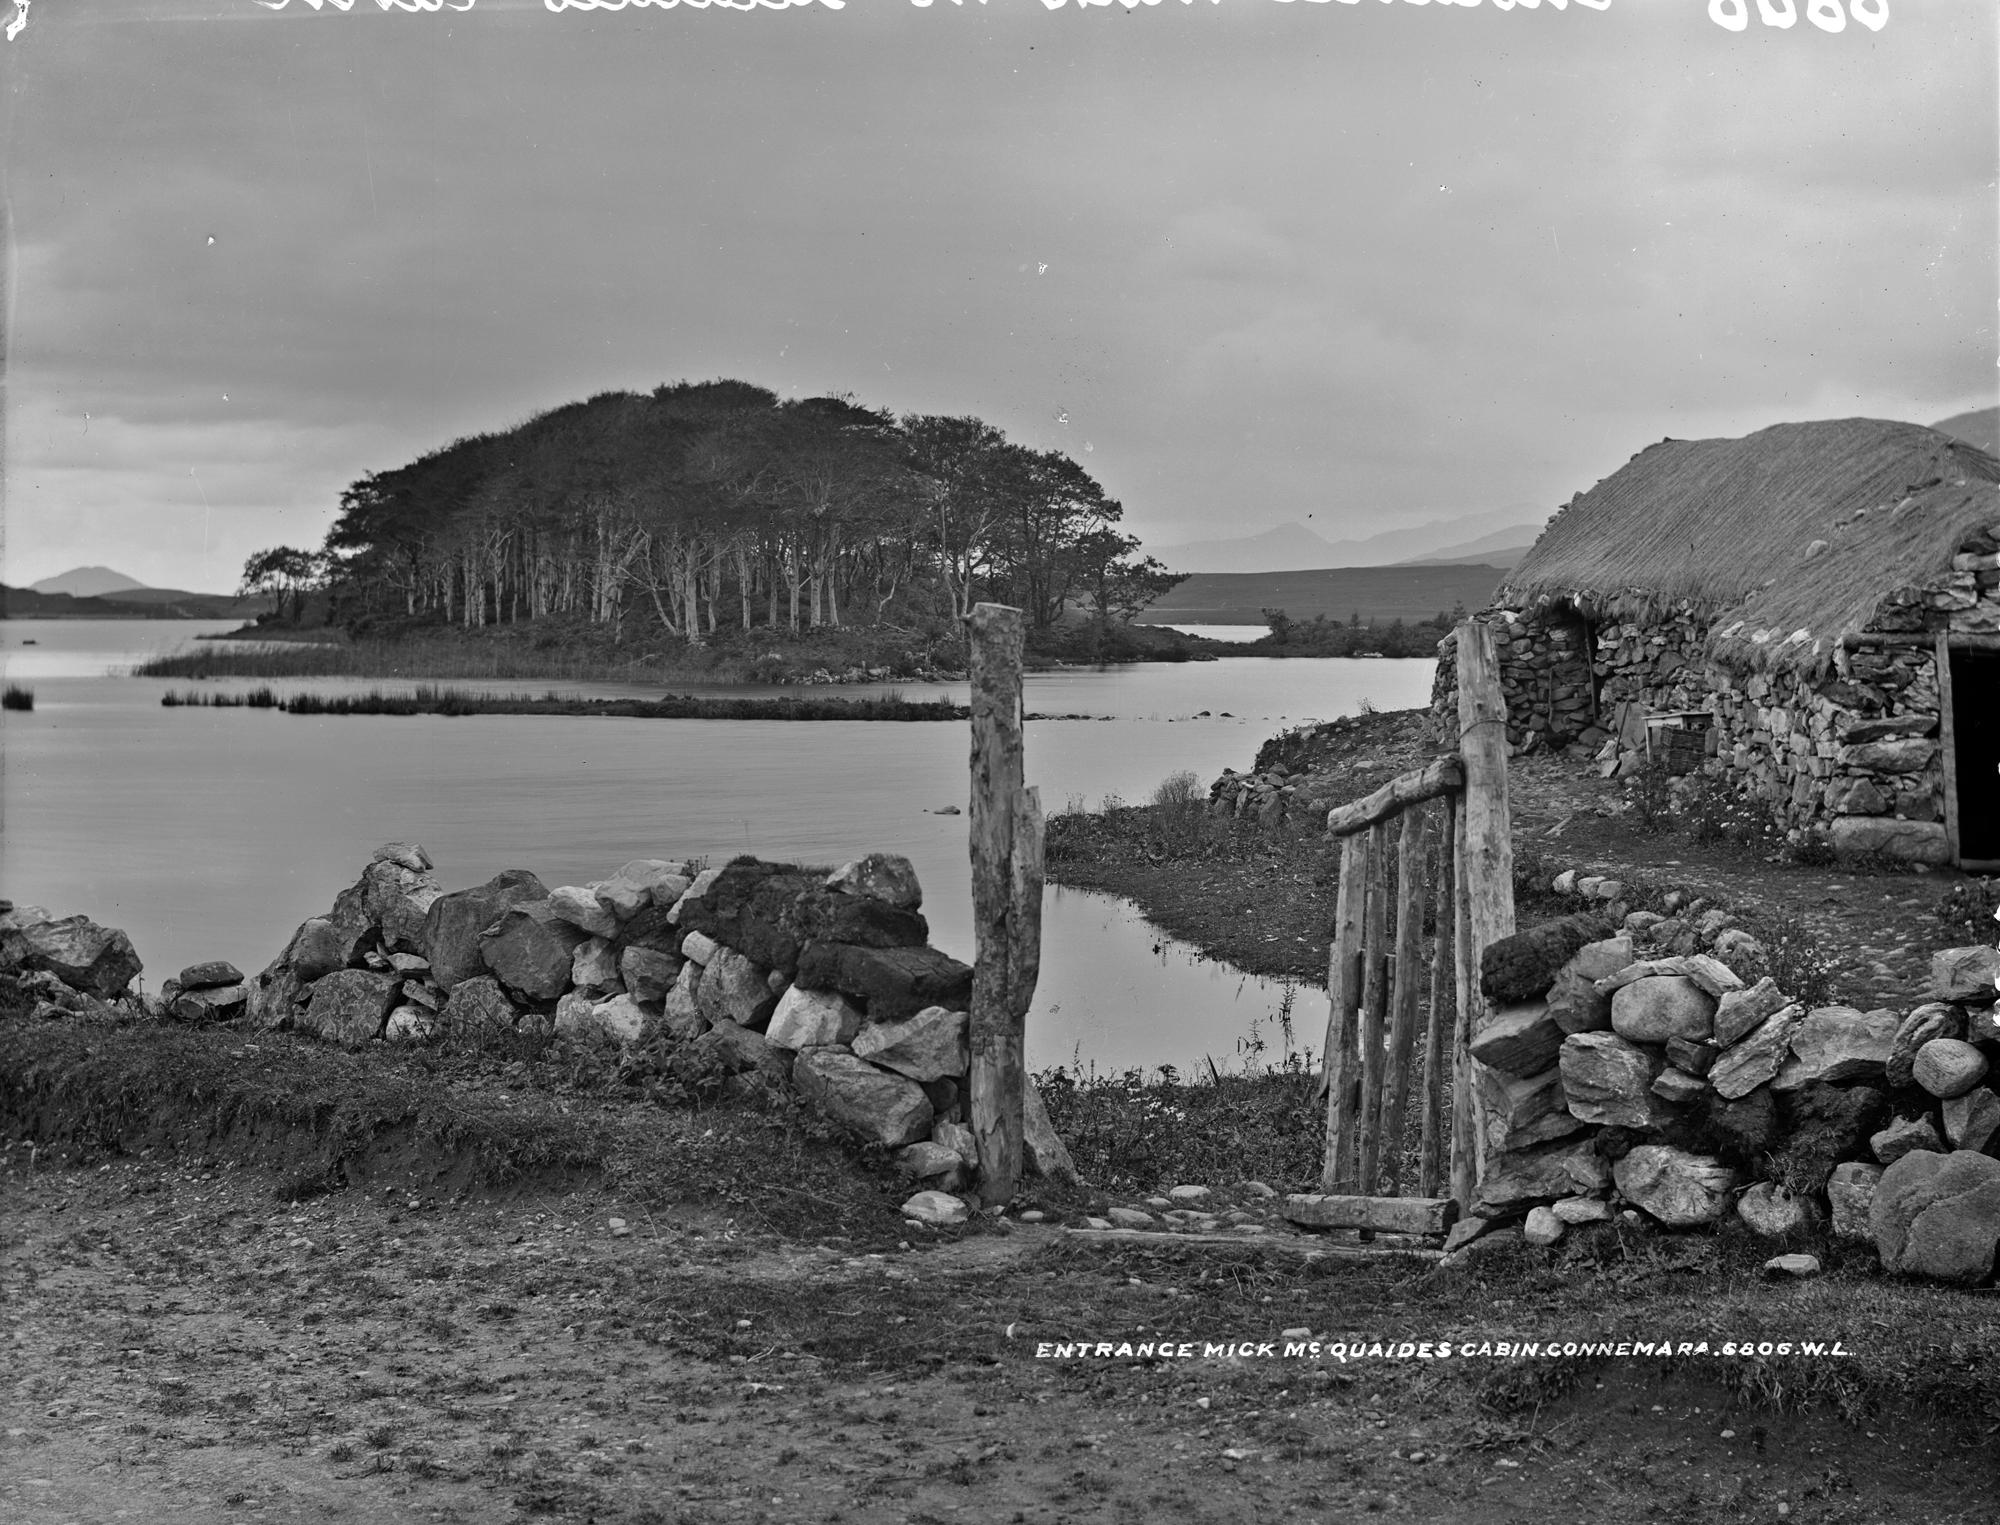 Mick McQuaid's Cabin, Connemara, Co. Galway